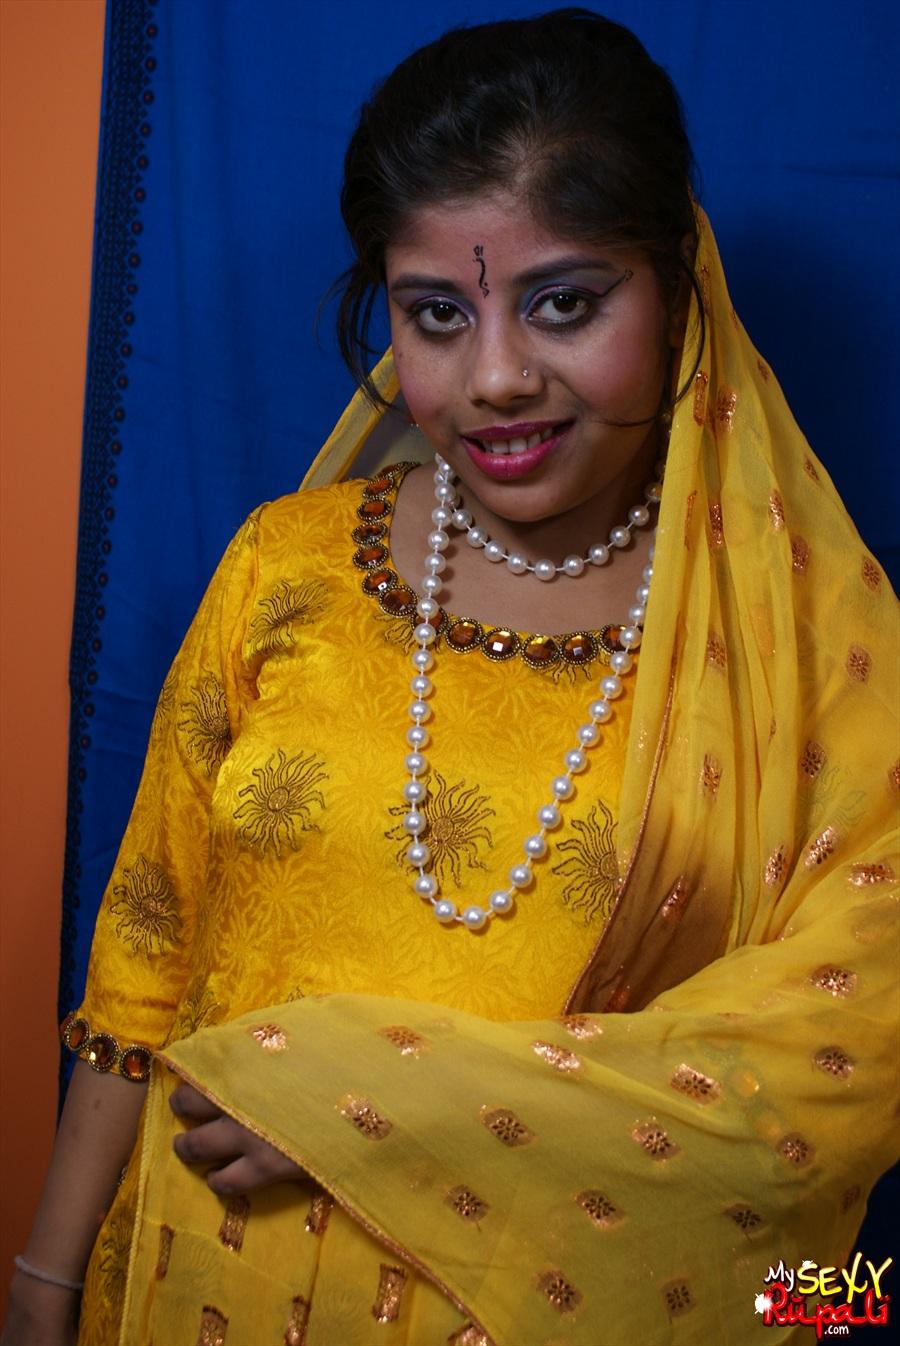 interracial marriage new zealand